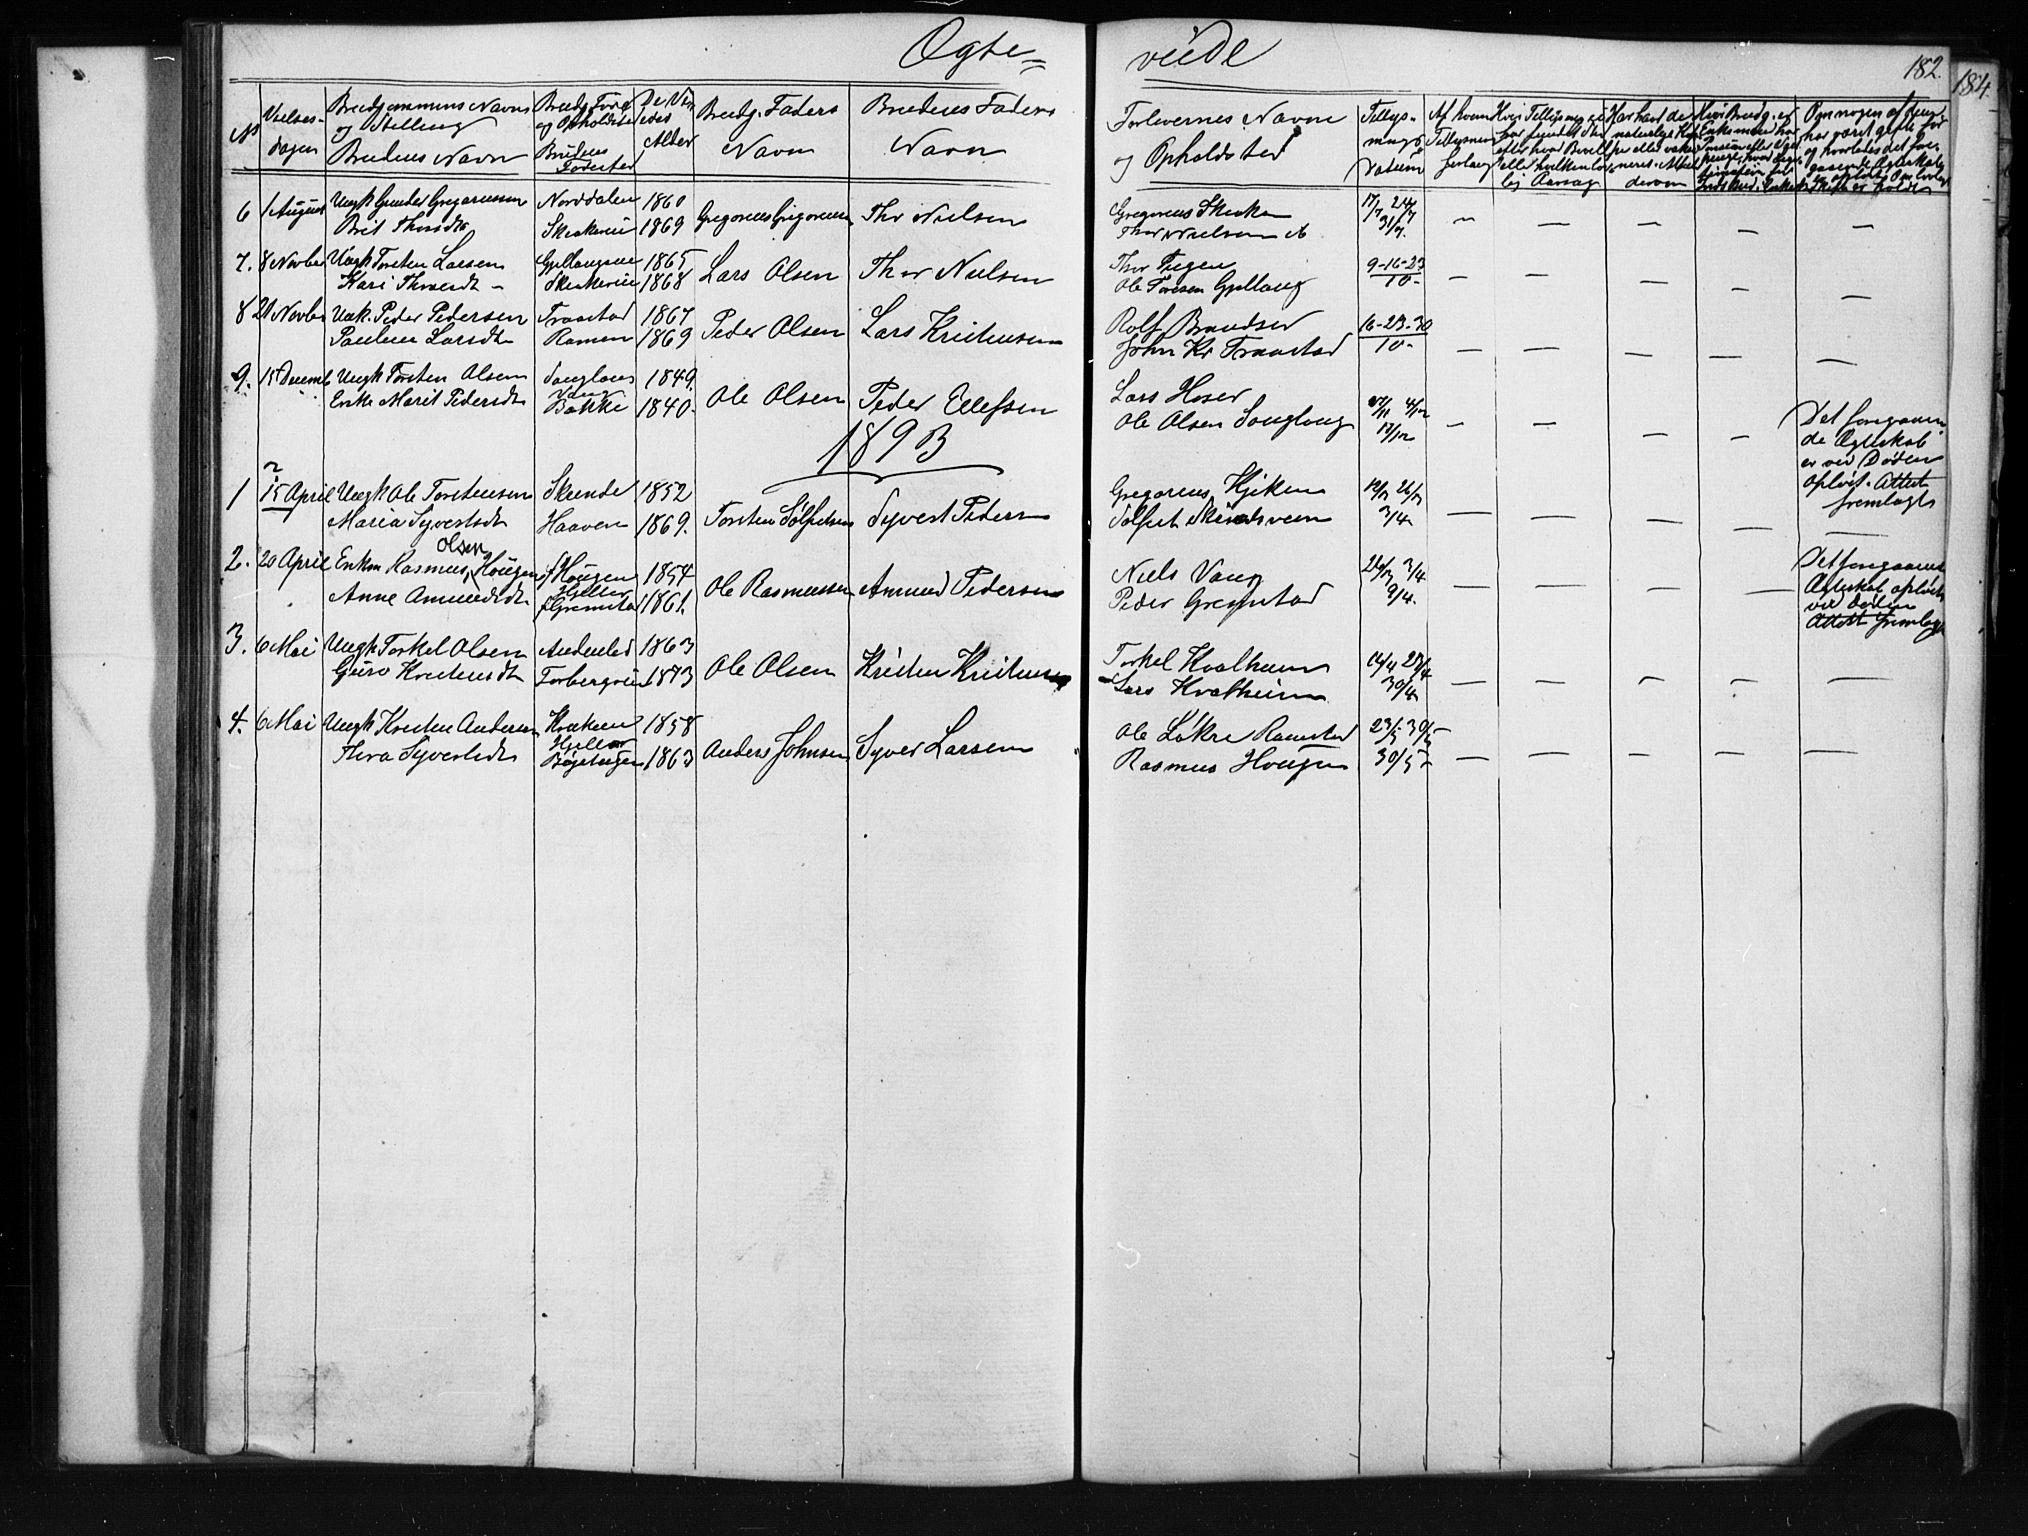 SAH, Skjåk prestekontor, Klokkerbok nr. 1, 1865-1893, s. 182